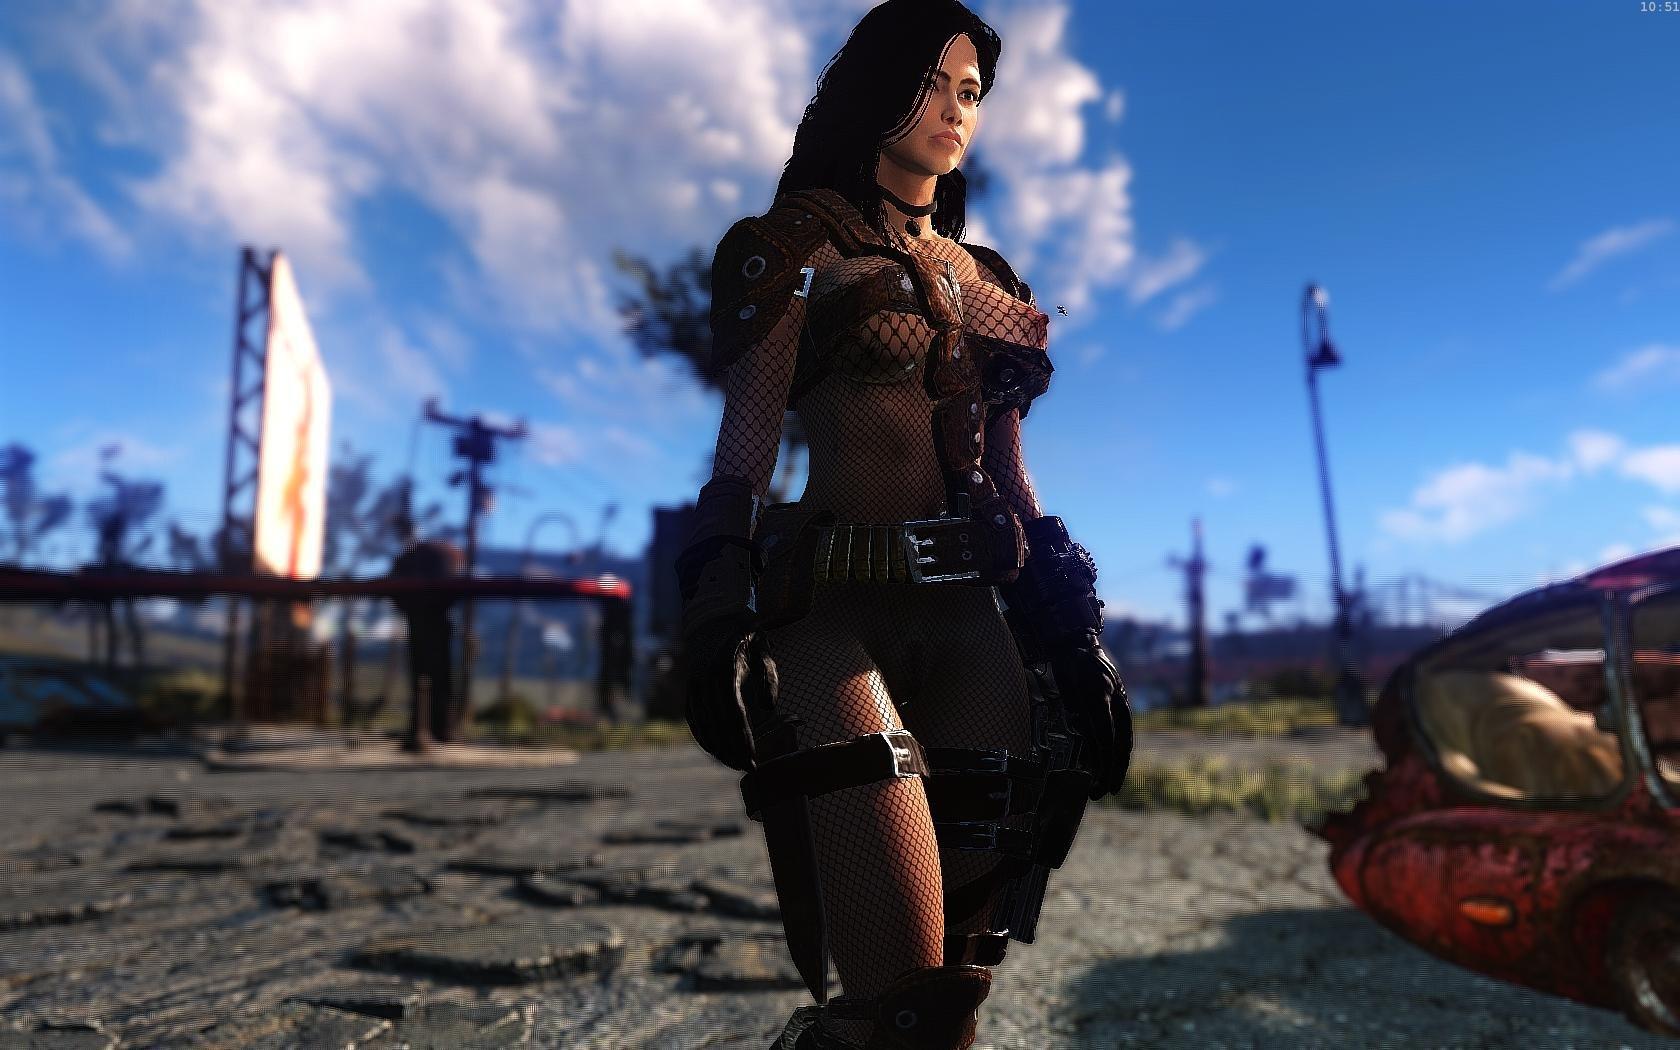 Fallout4 2019-01-13 10-51-56-11